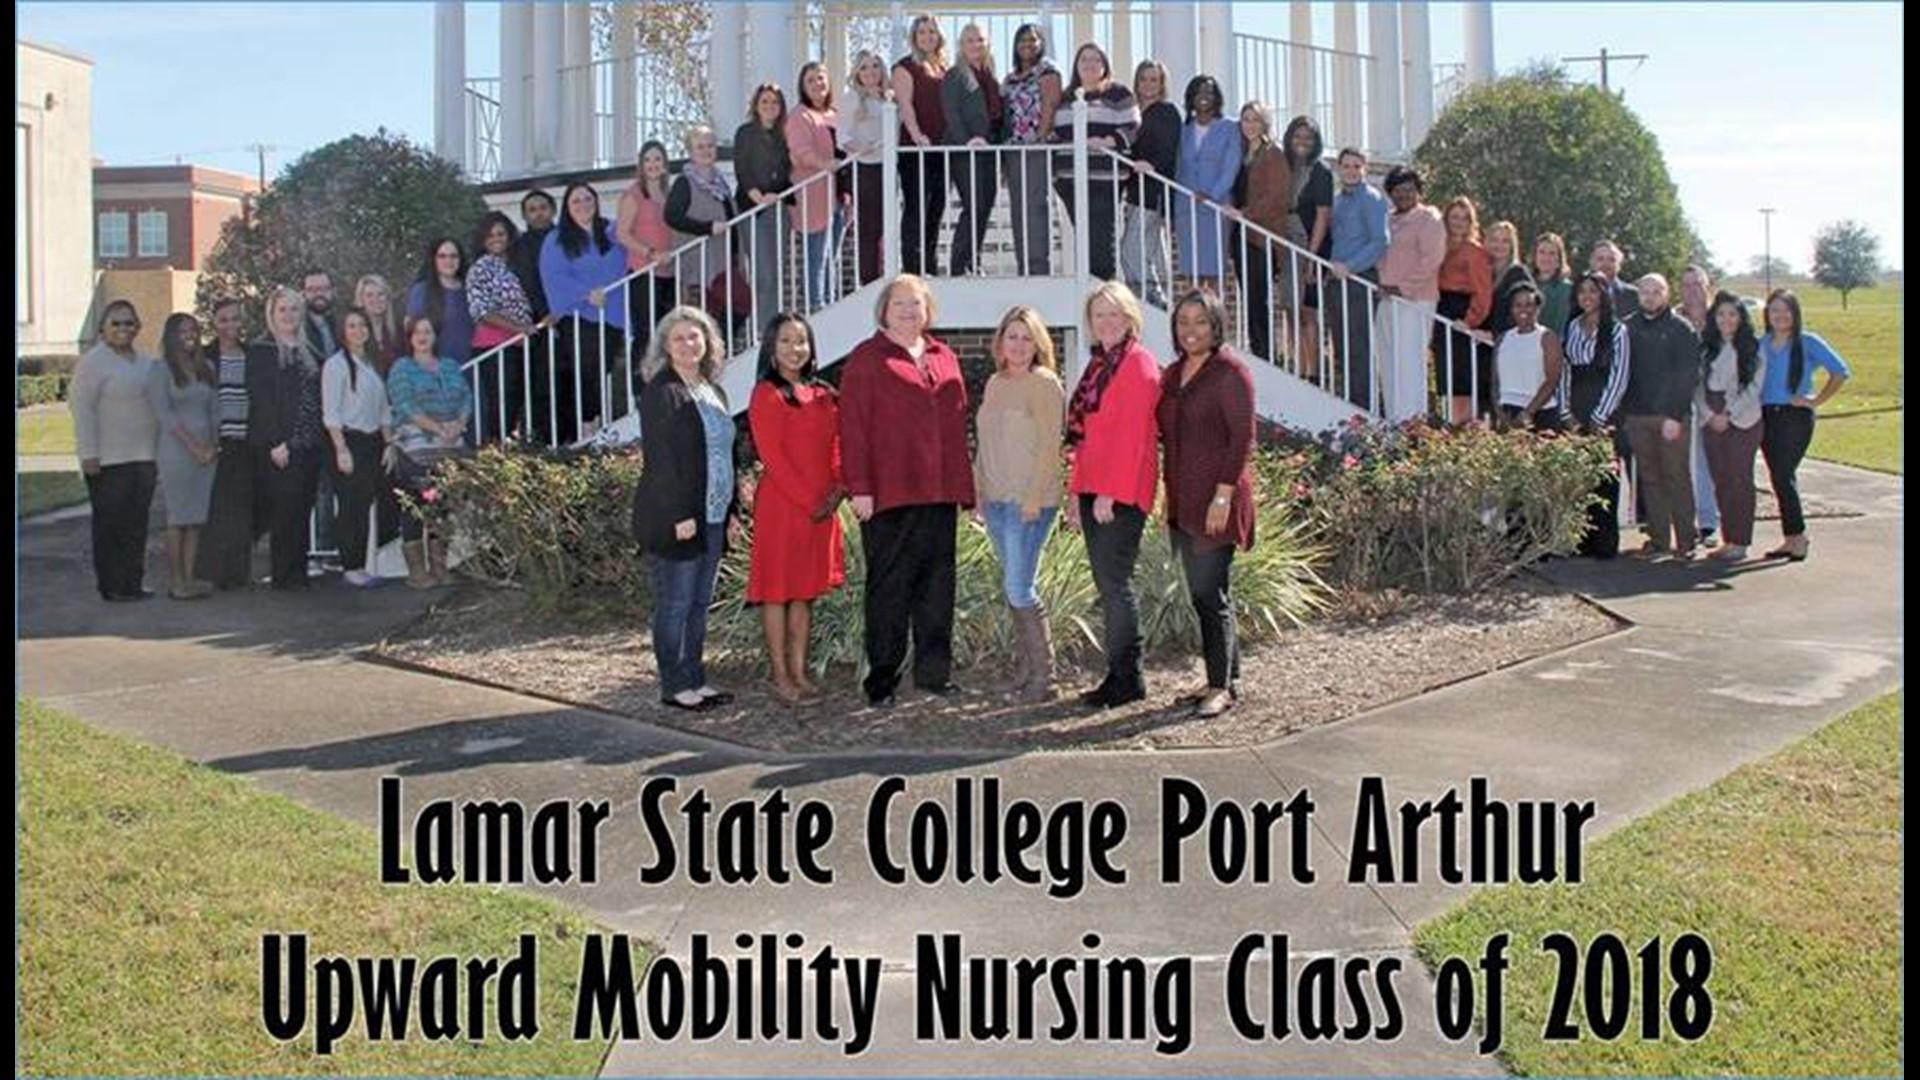 Lamar State College Port Arthur's nursing program ...